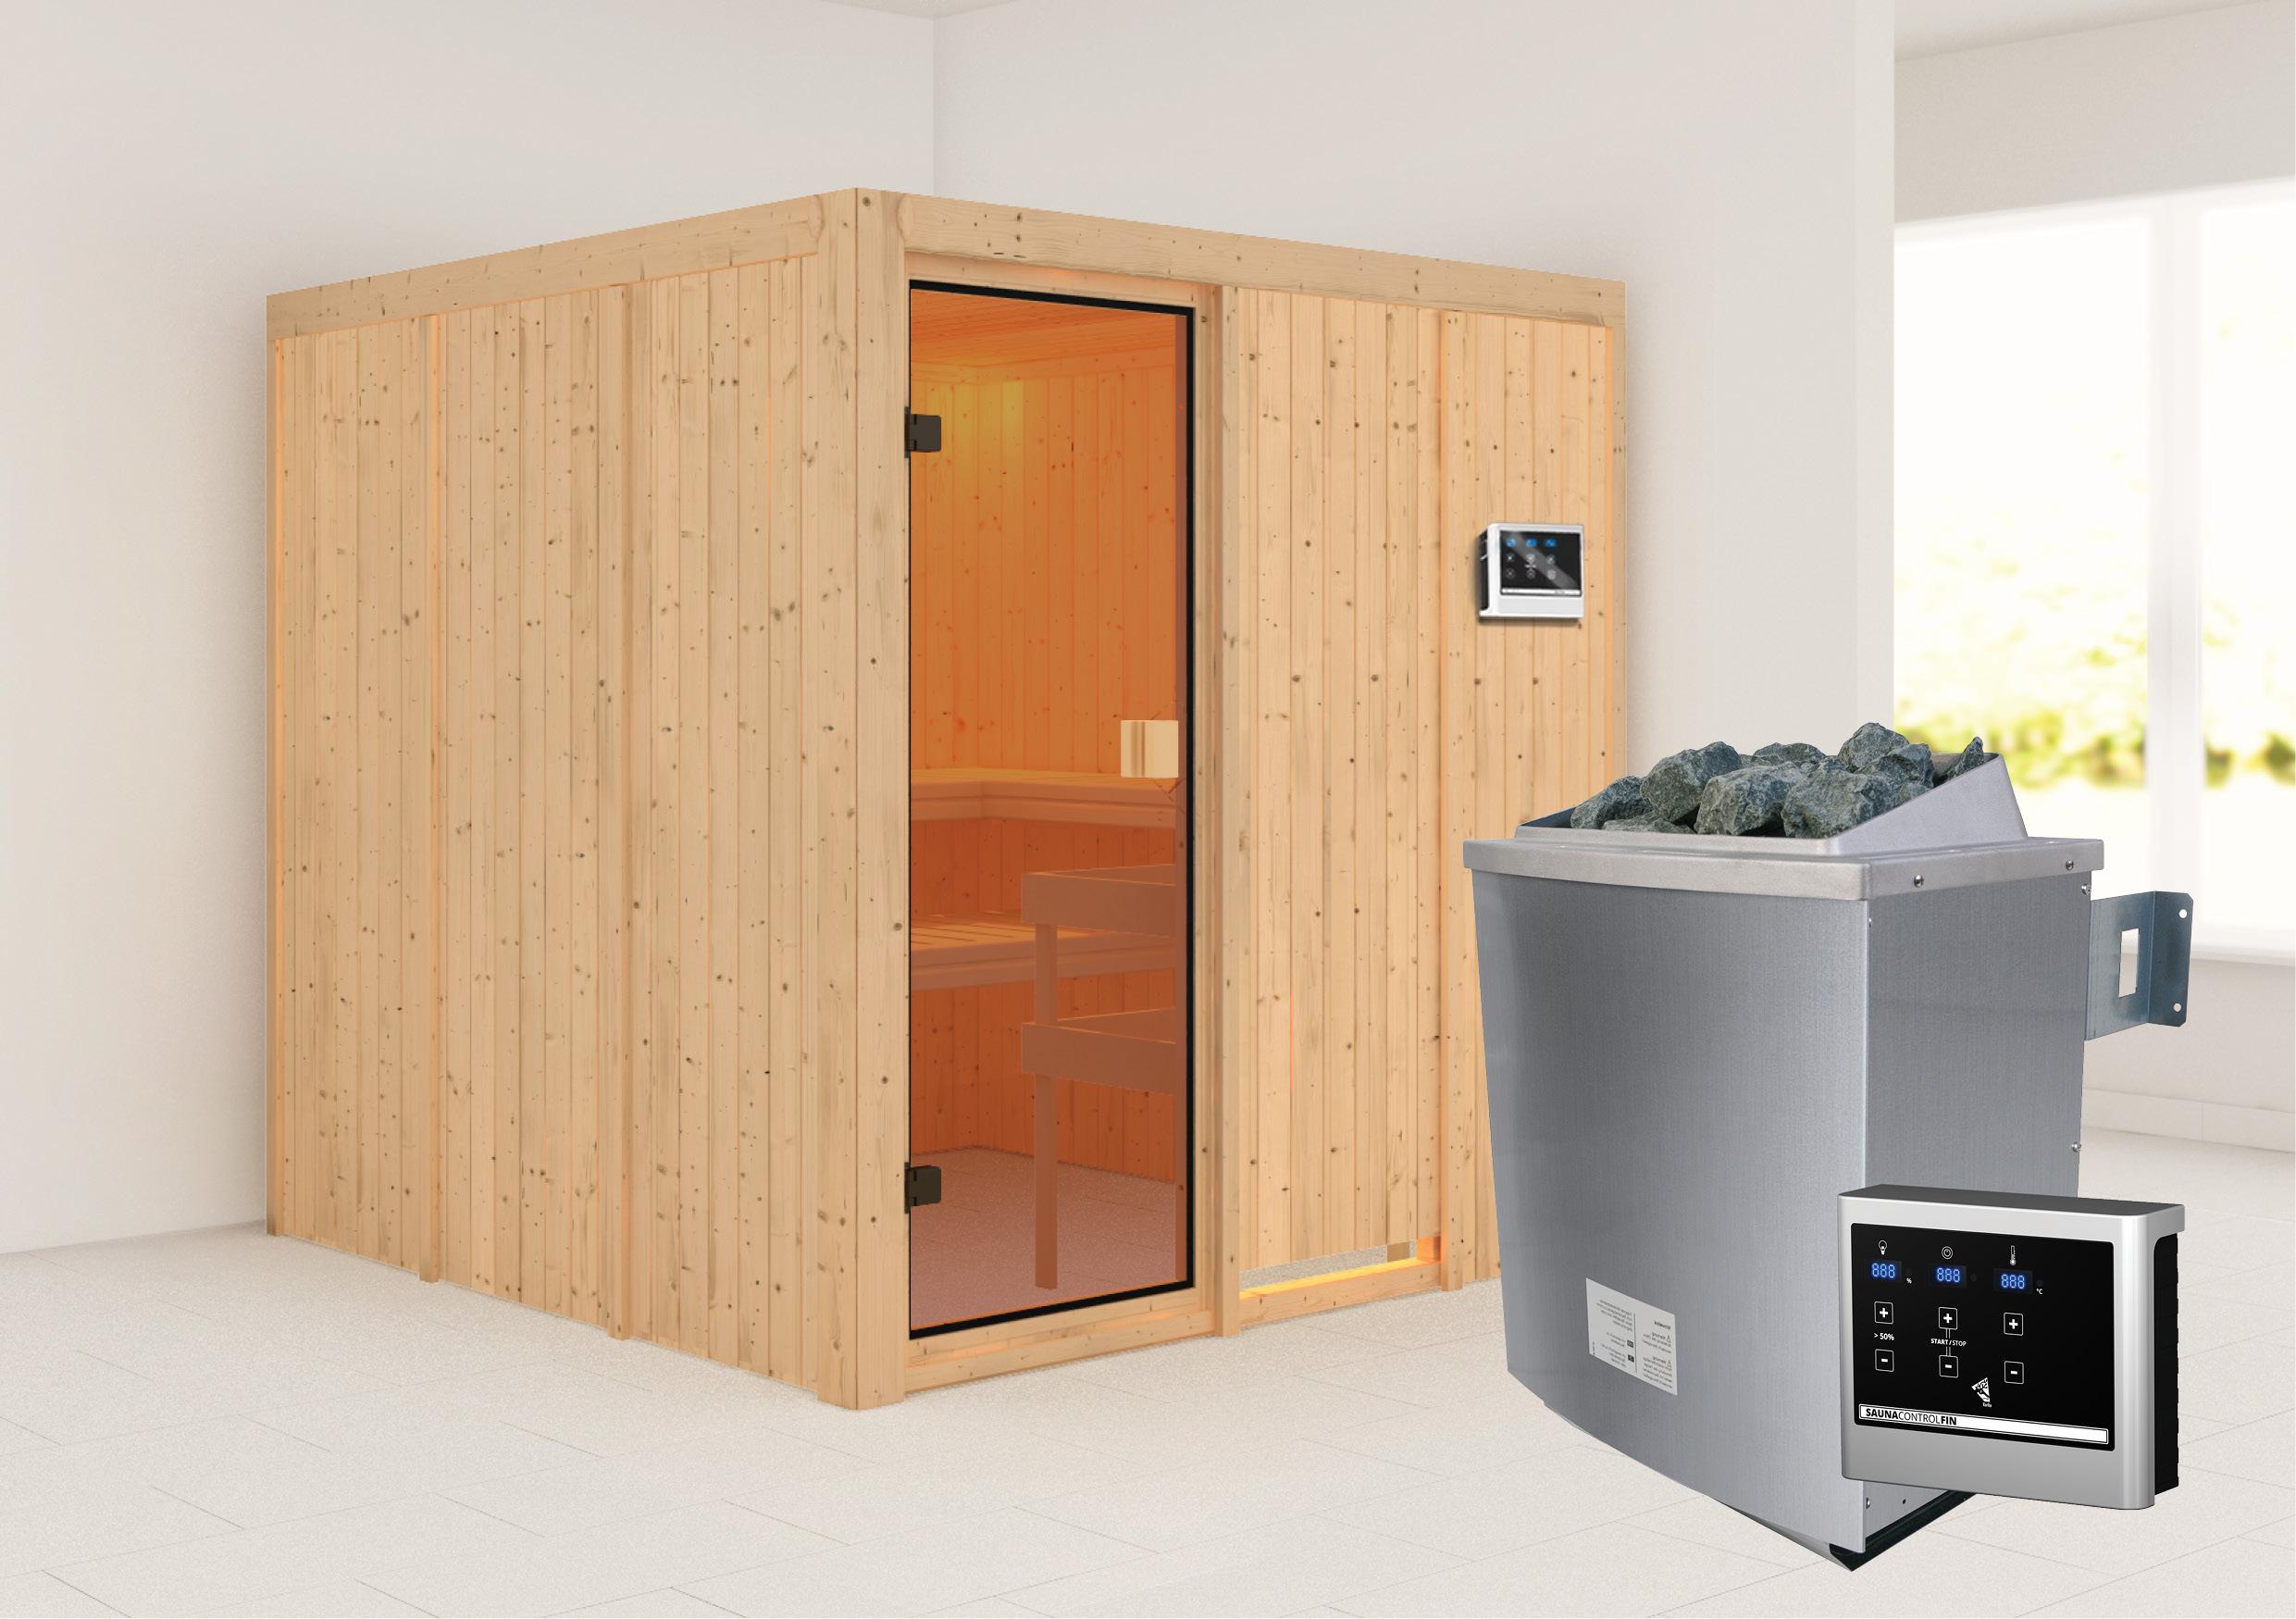 Woodfeeling Sauna Oulu 68mm Saunaofen 9kW extern Bild 1